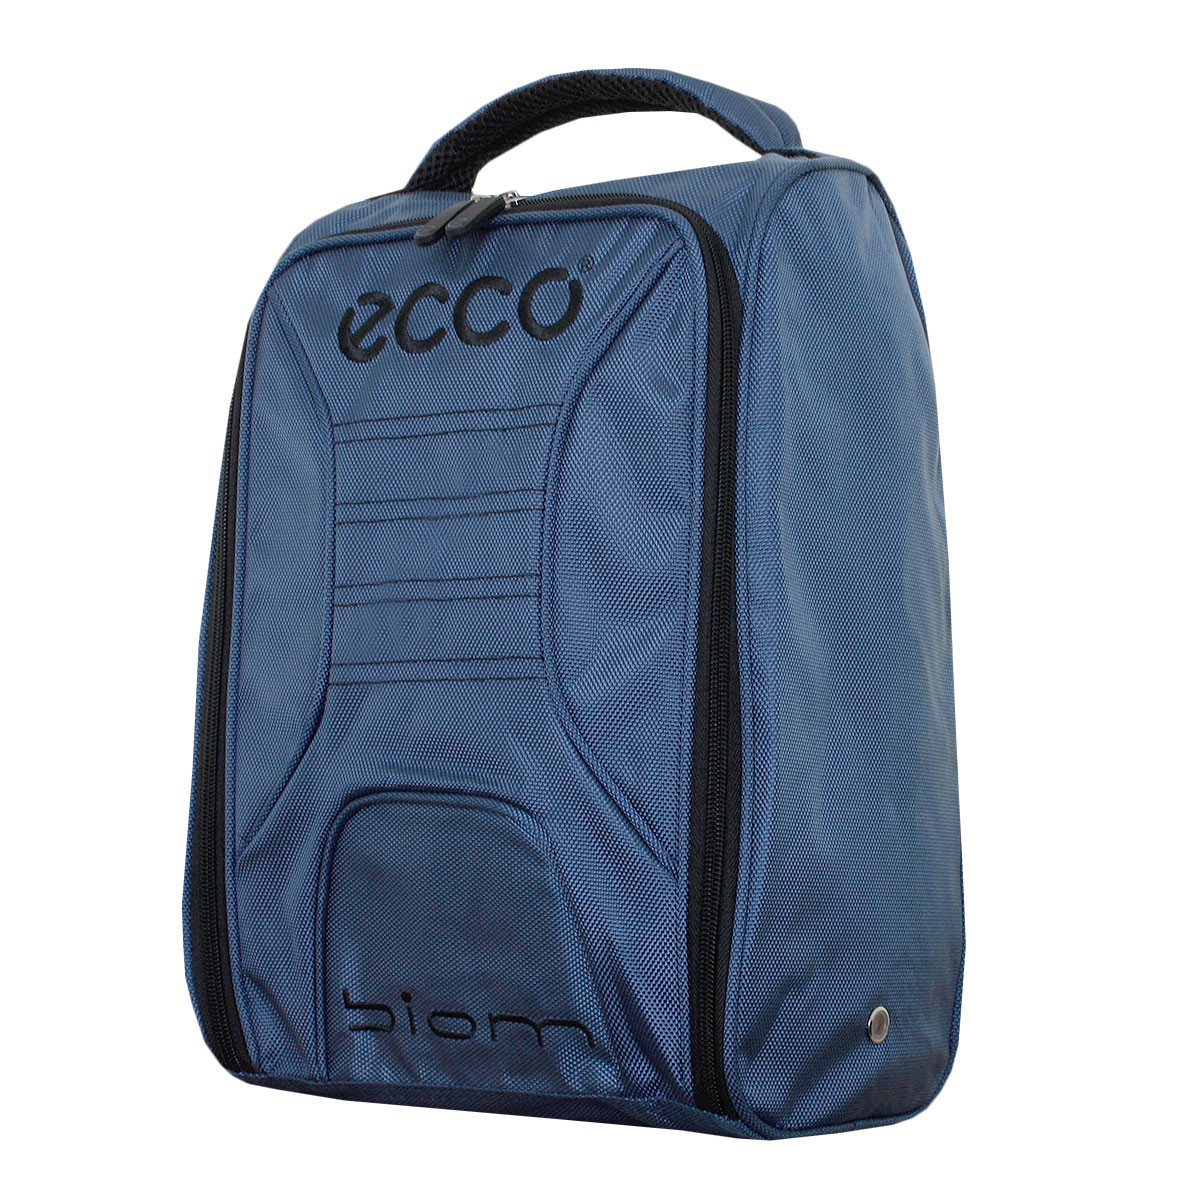 a69bbb3a7f0d Ecco Golf Shoe Bag Blue - London Pro Golf